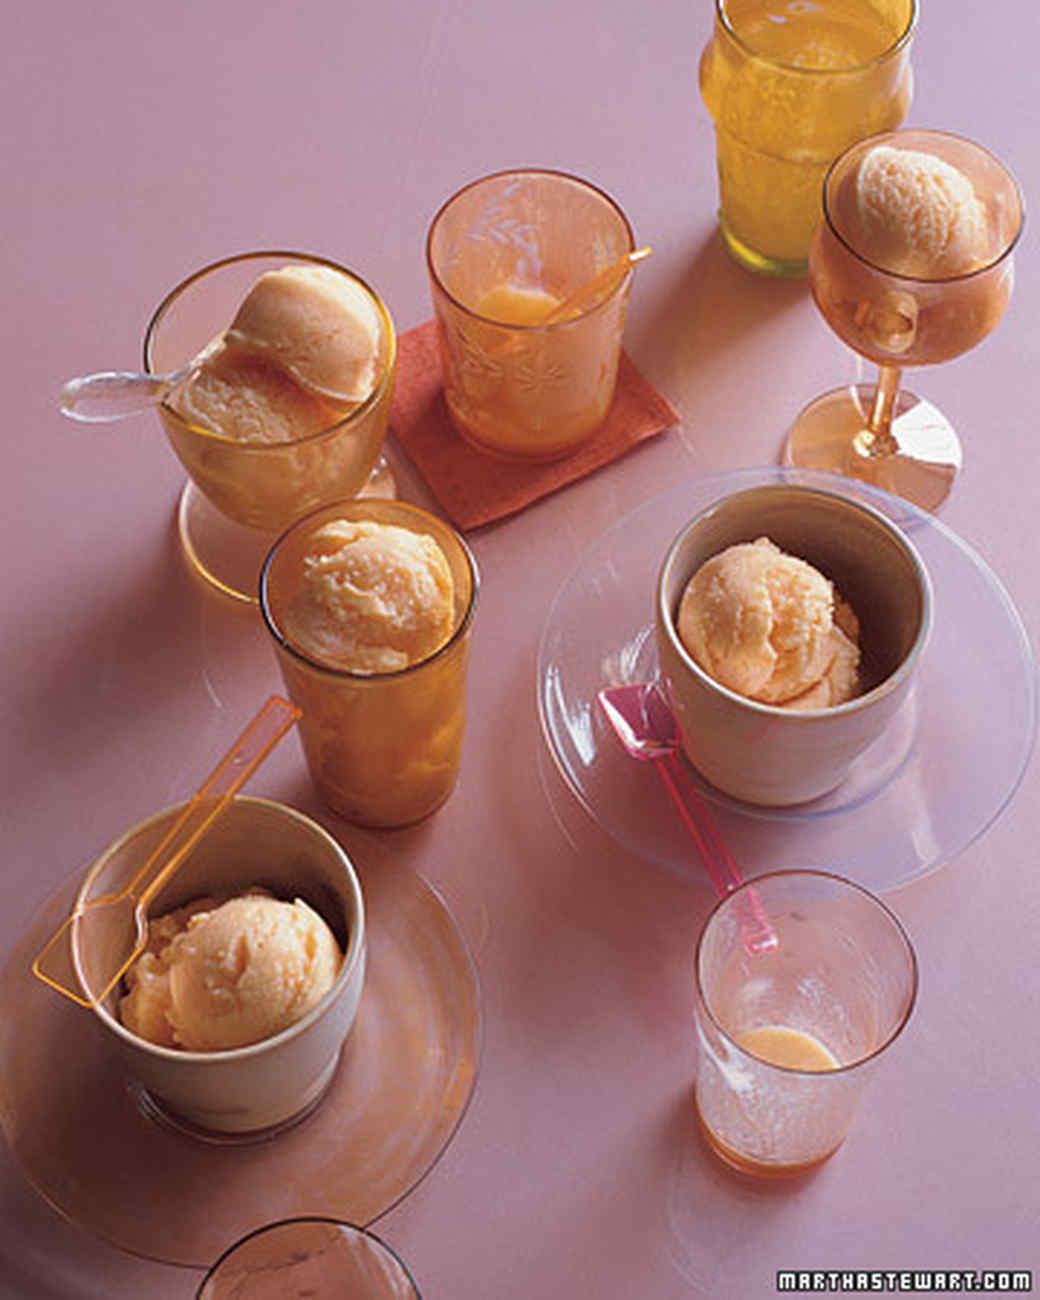 Peach and Buttermilk Sherbet